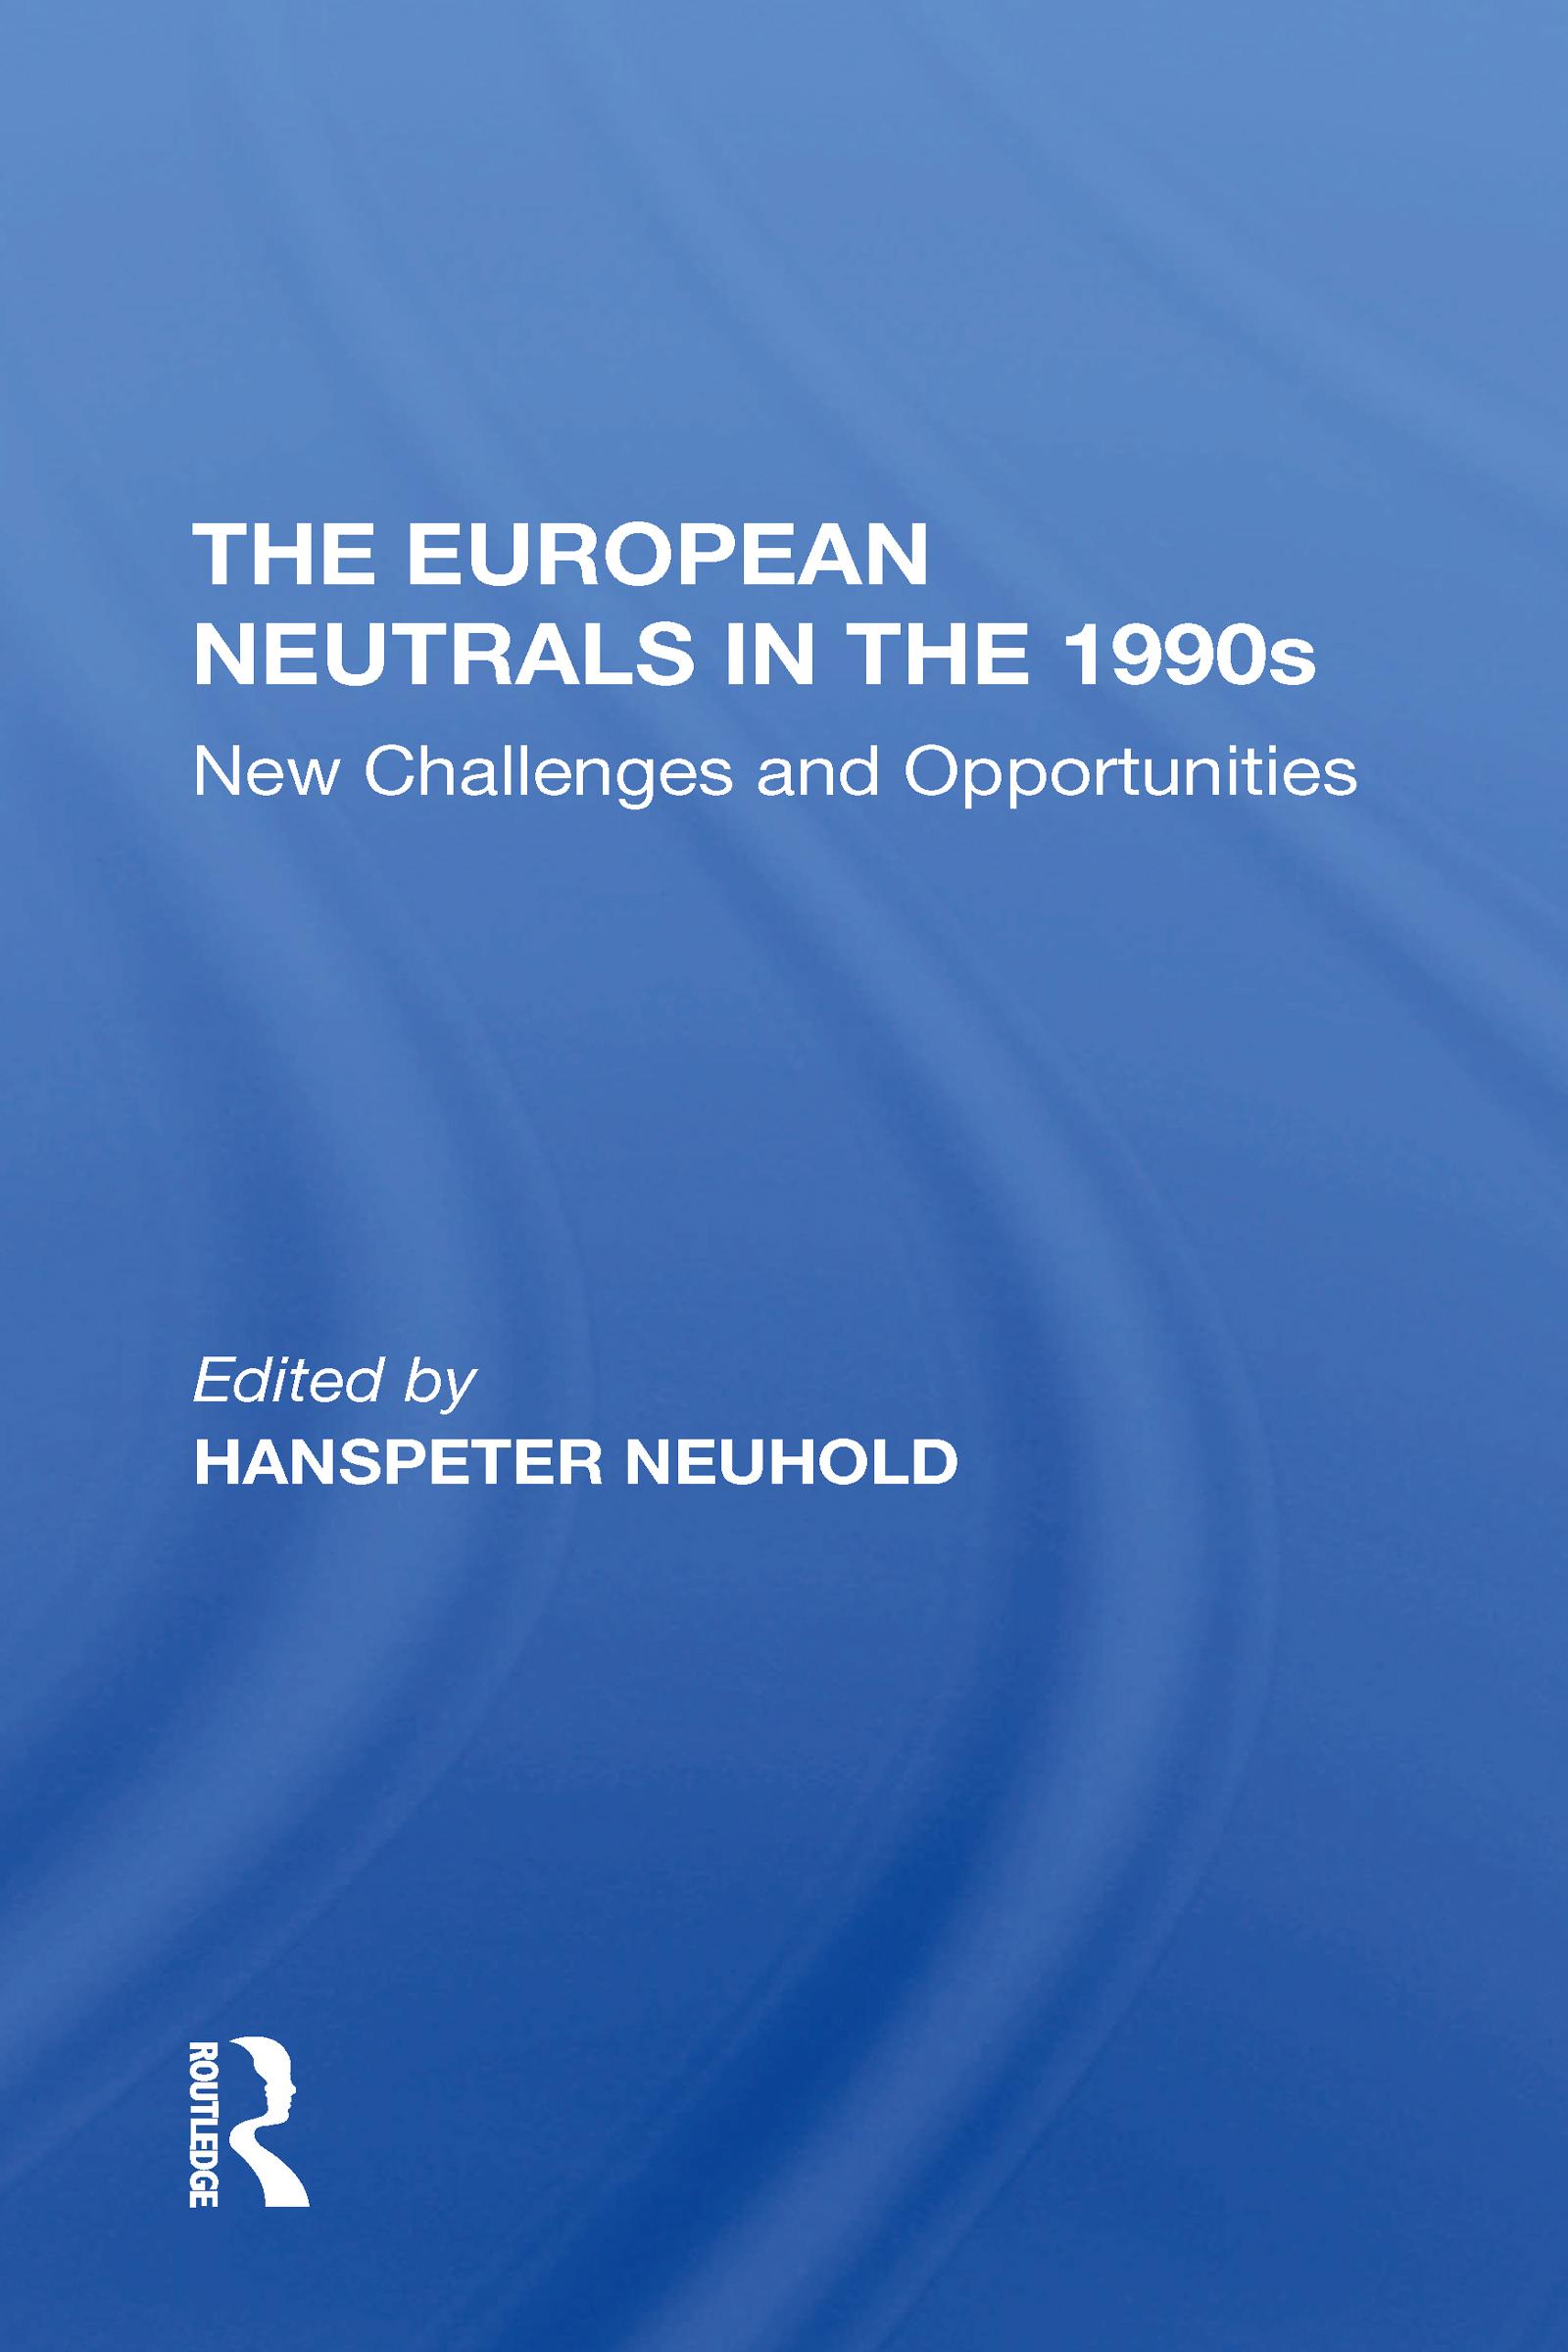 The European Neutrals In The 1990s